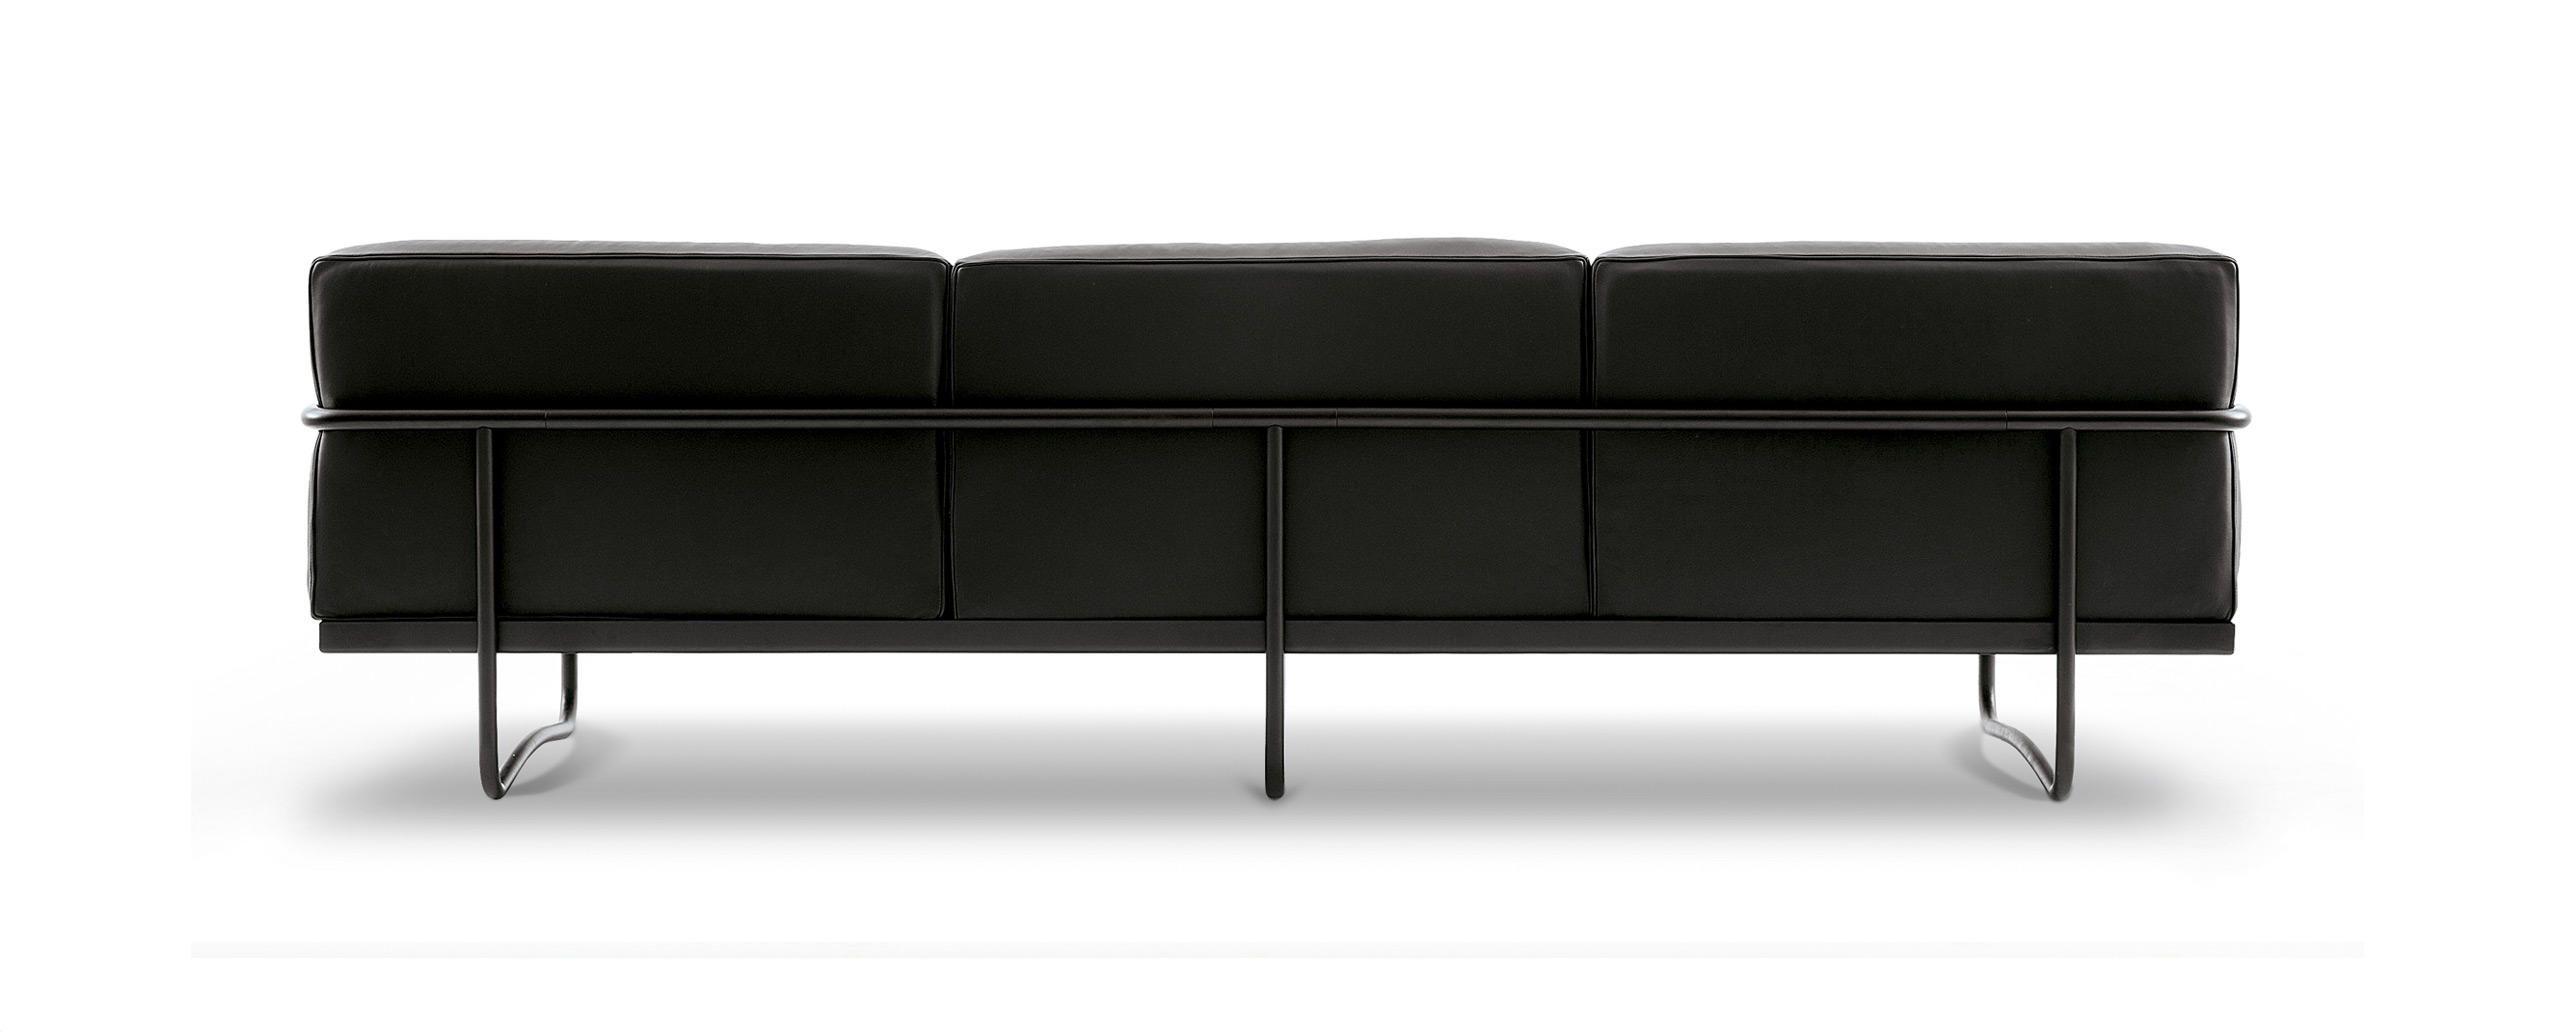 LC5 - Le Corbusier, Jeanneret, Perriand | Cassina | Cassina ...